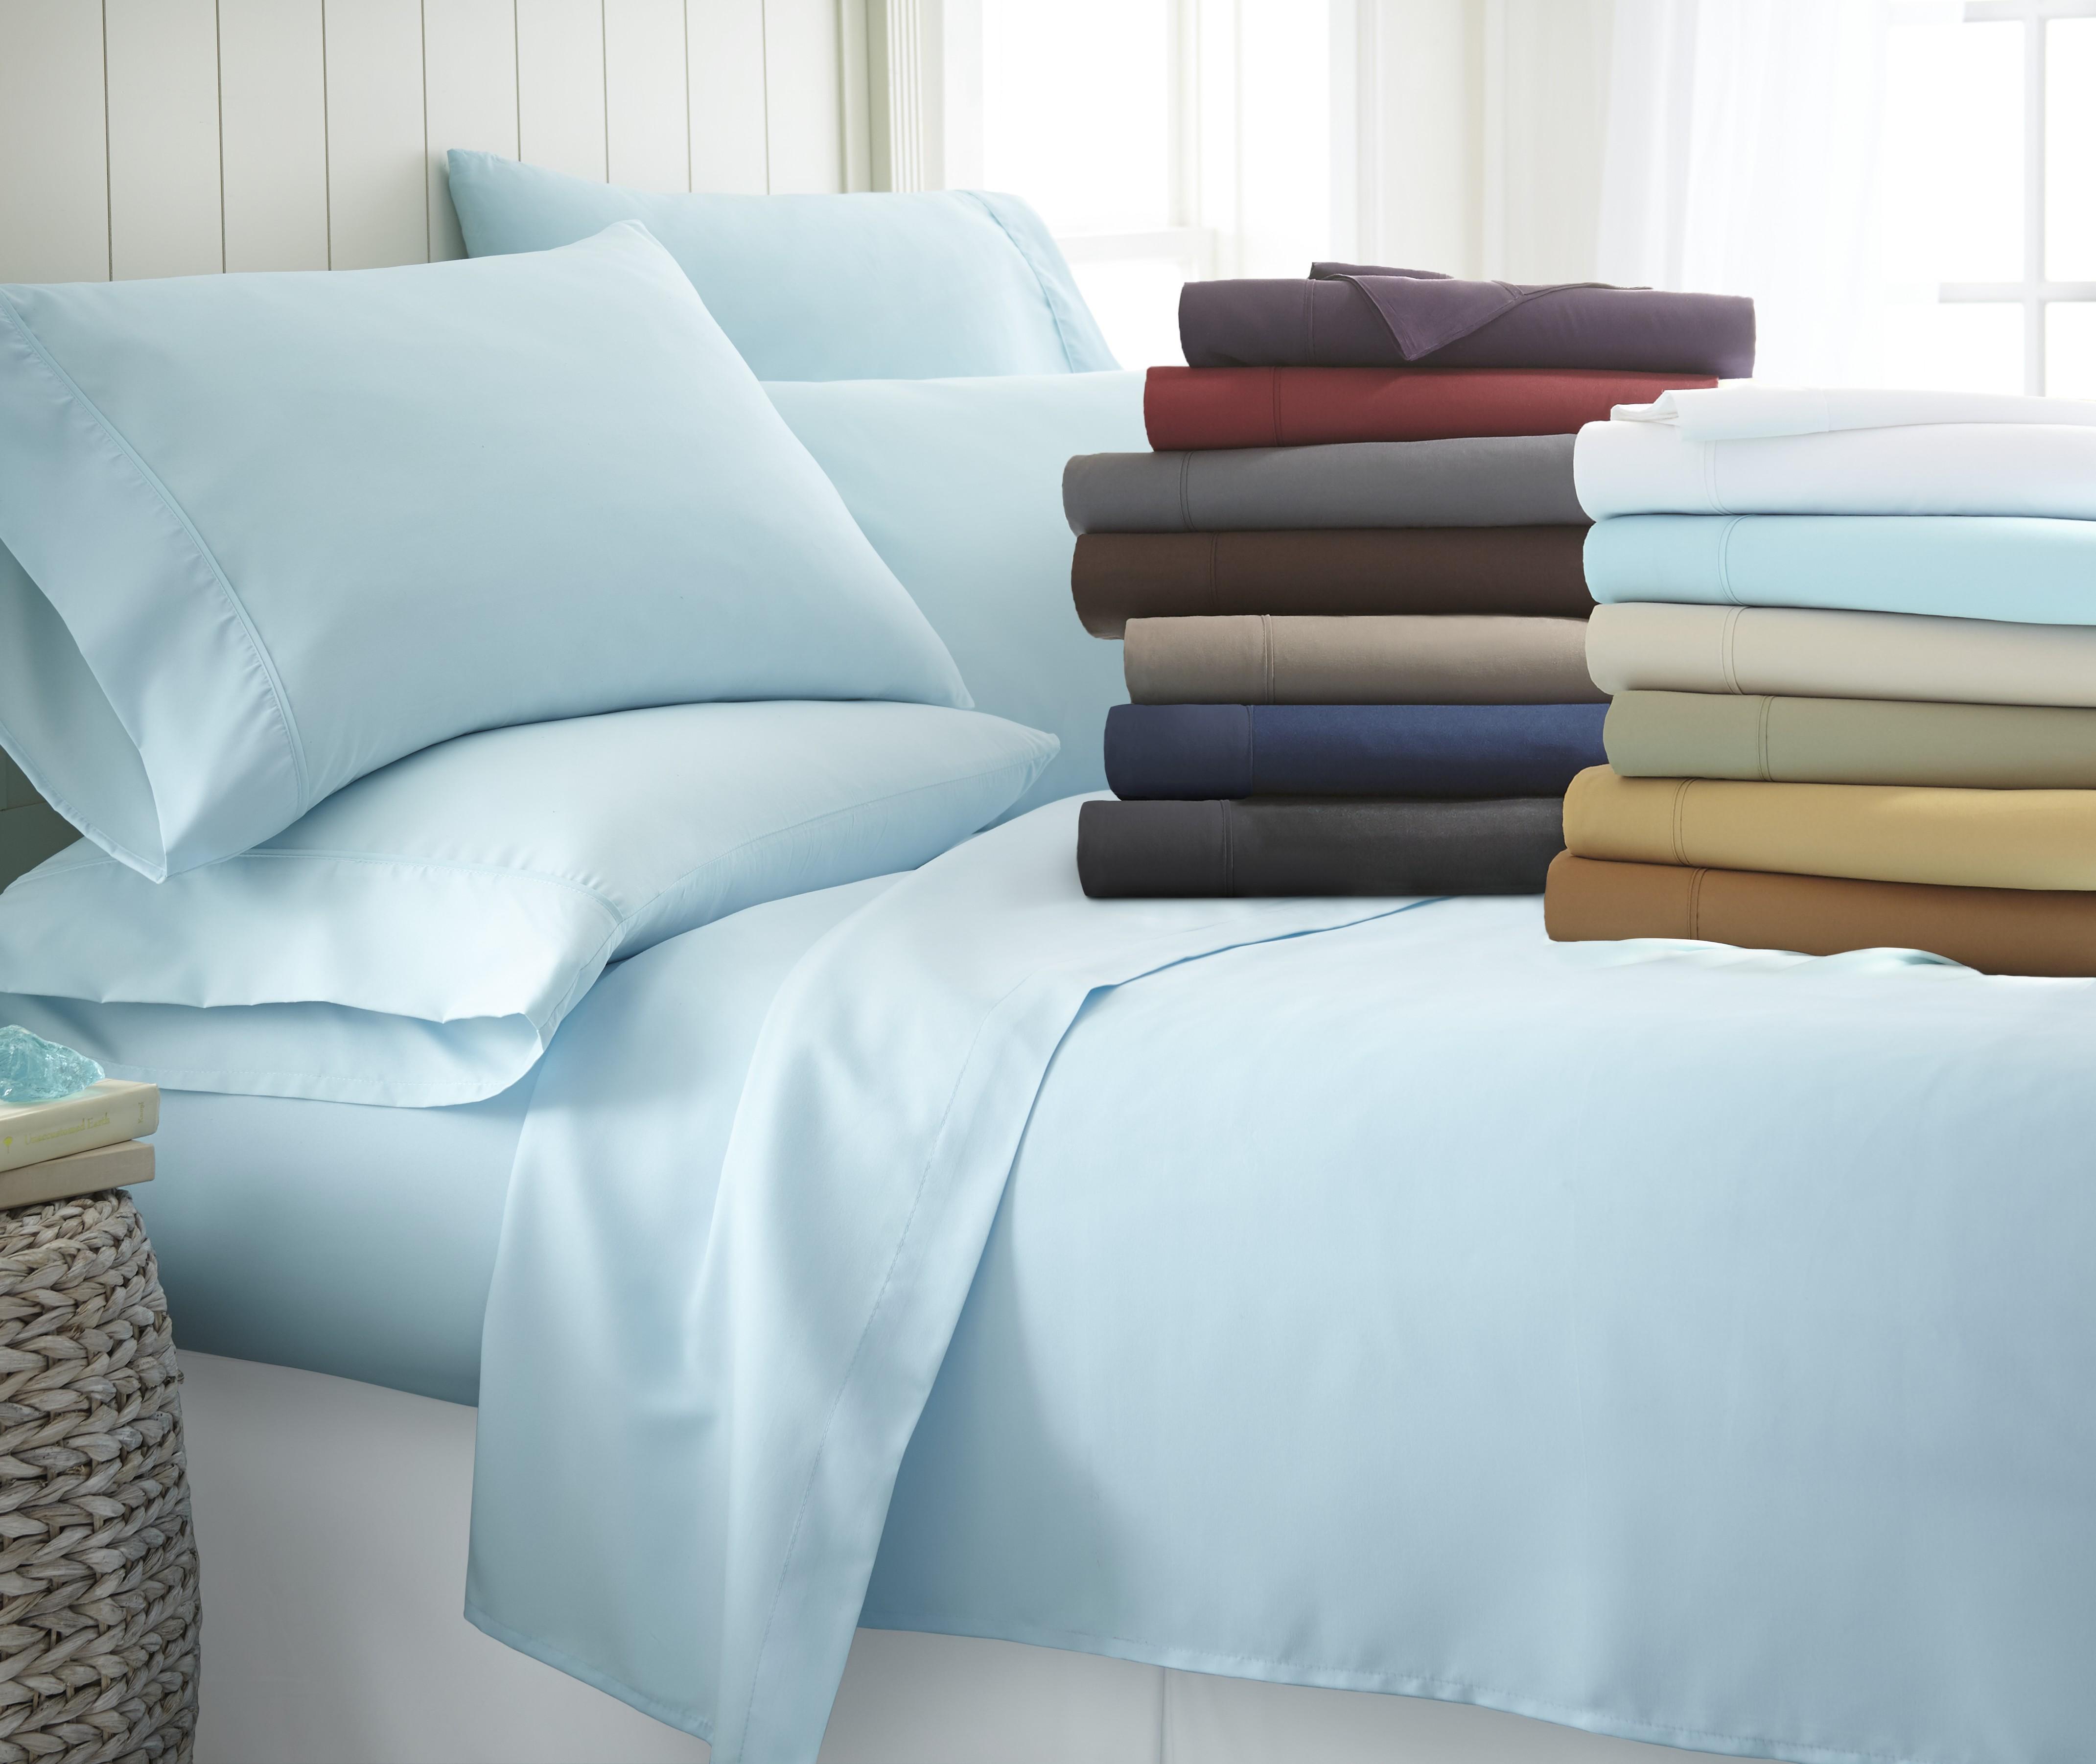 Premium Ultra Soft 6 Piece Bed Sheet Set - Home - Bed ...